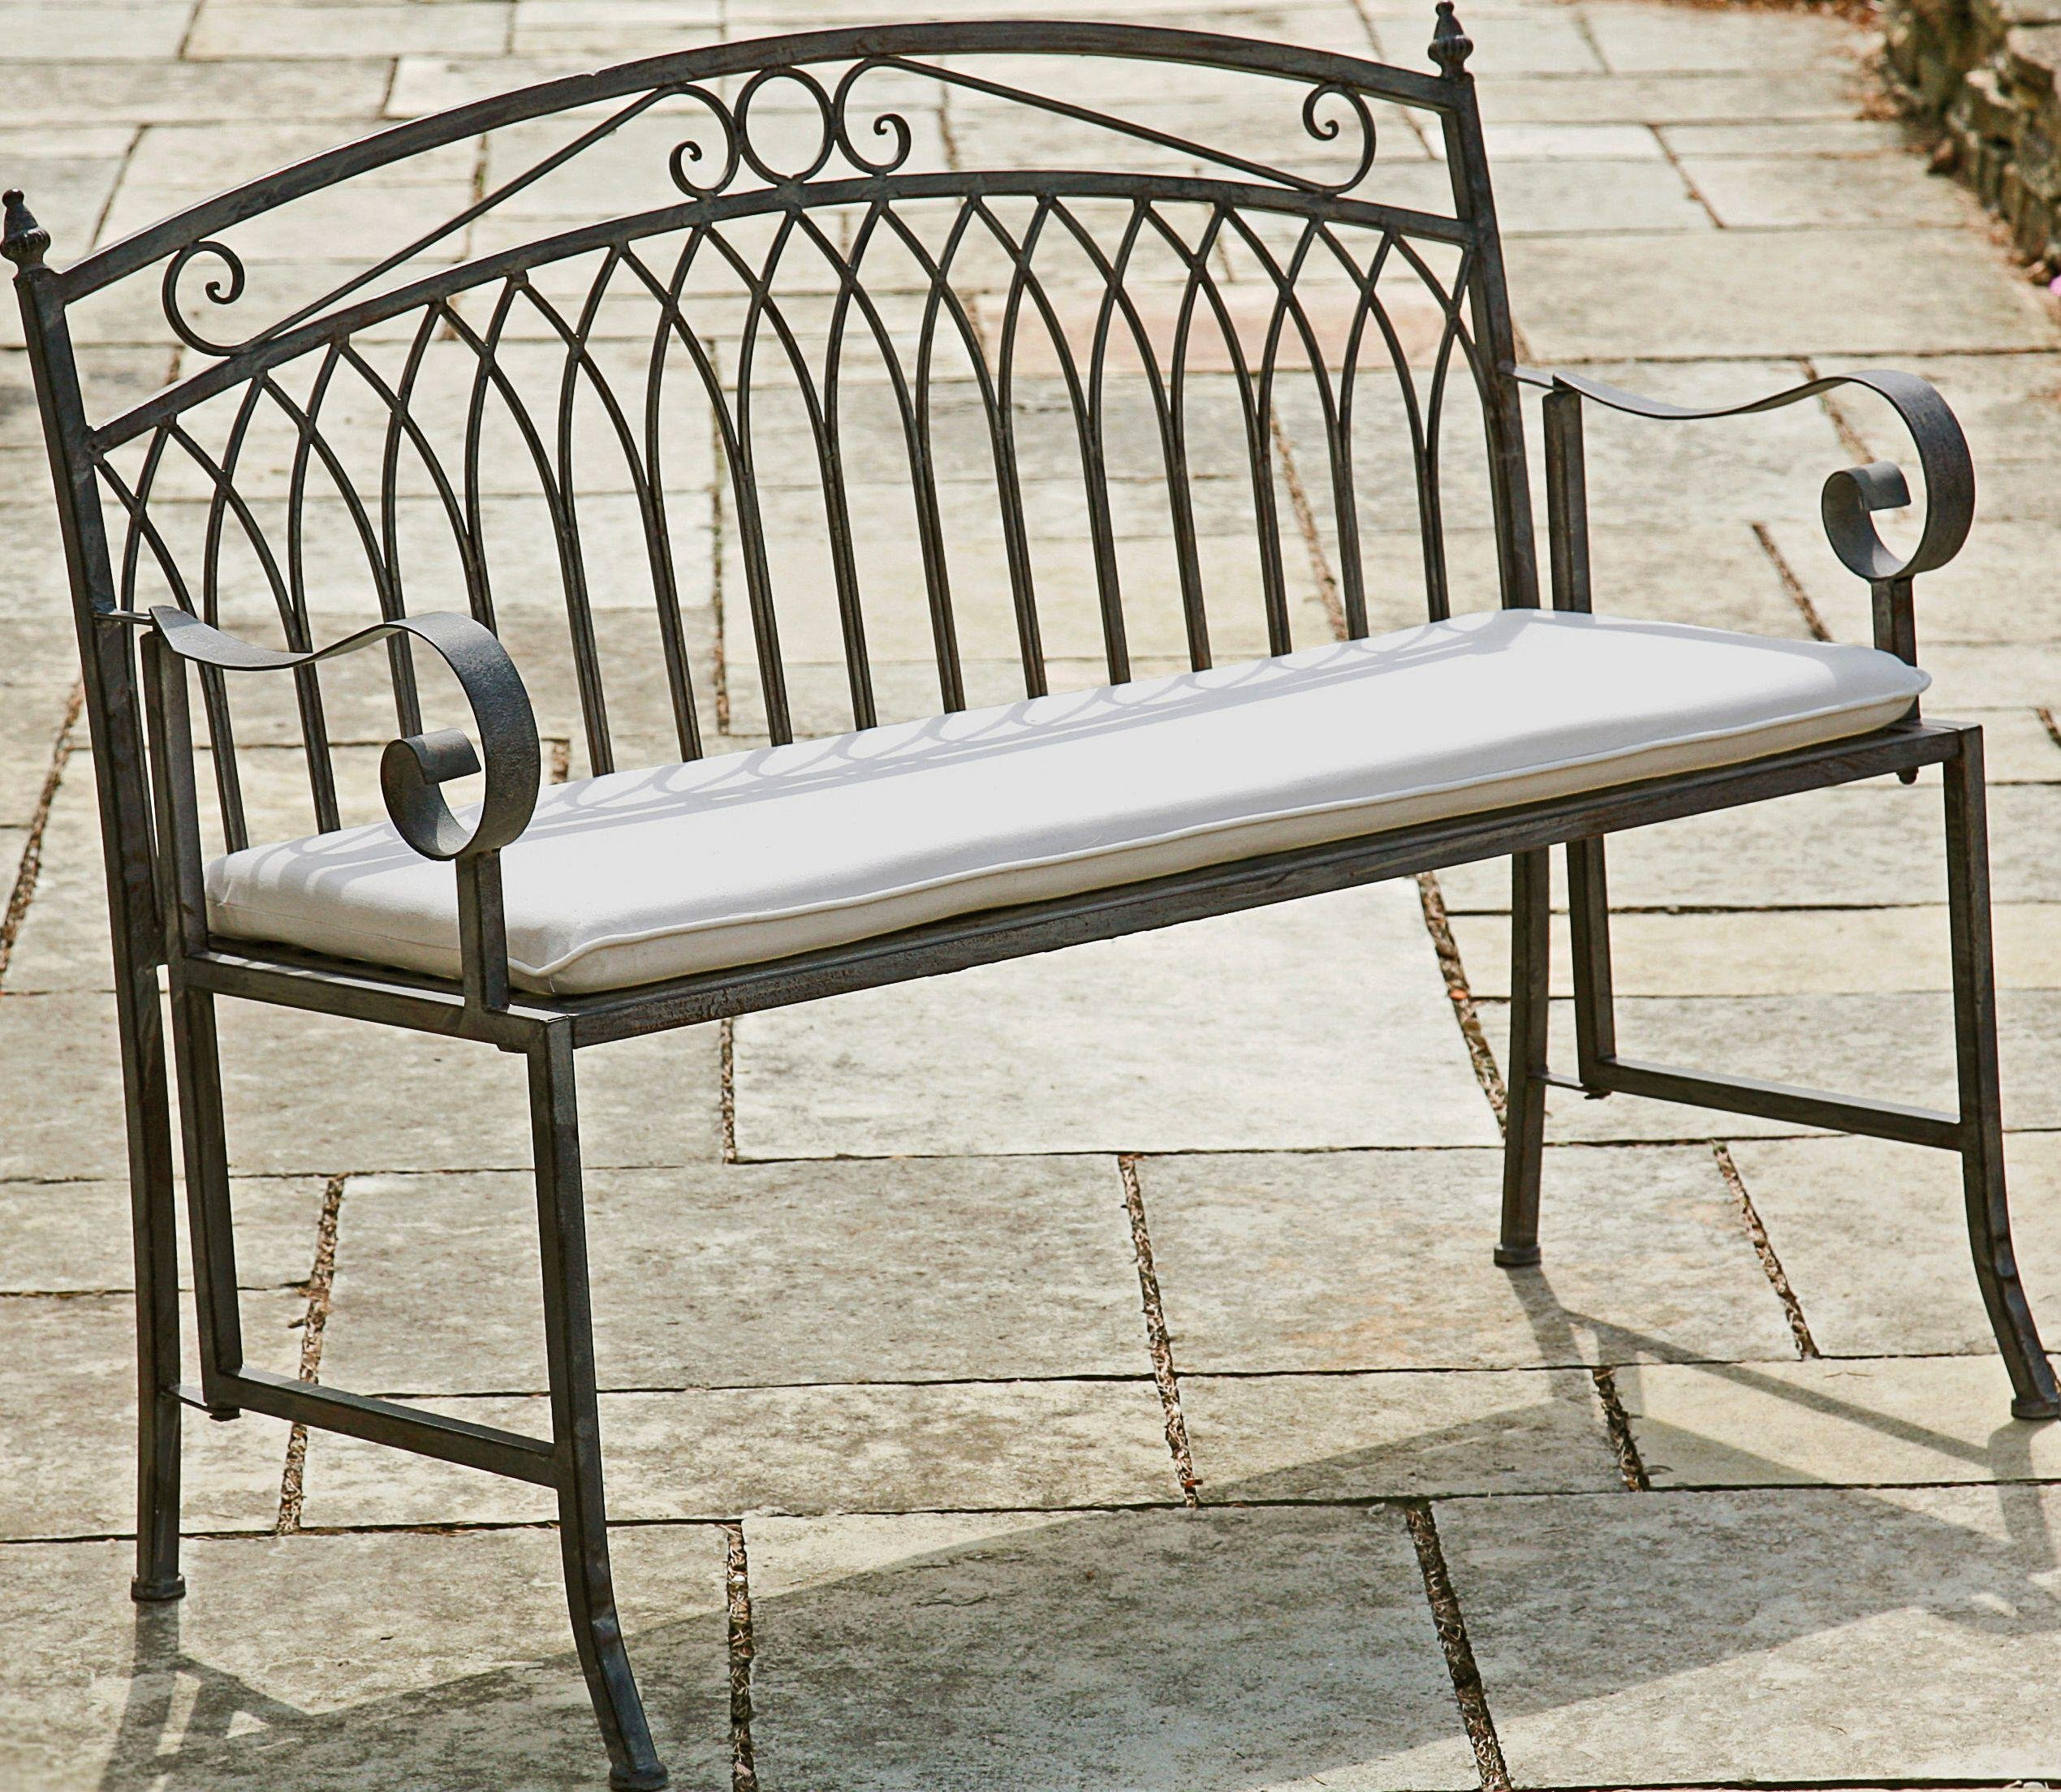 Argos Garden Bench: Versailles Garden Steel Folding Bench - Grey